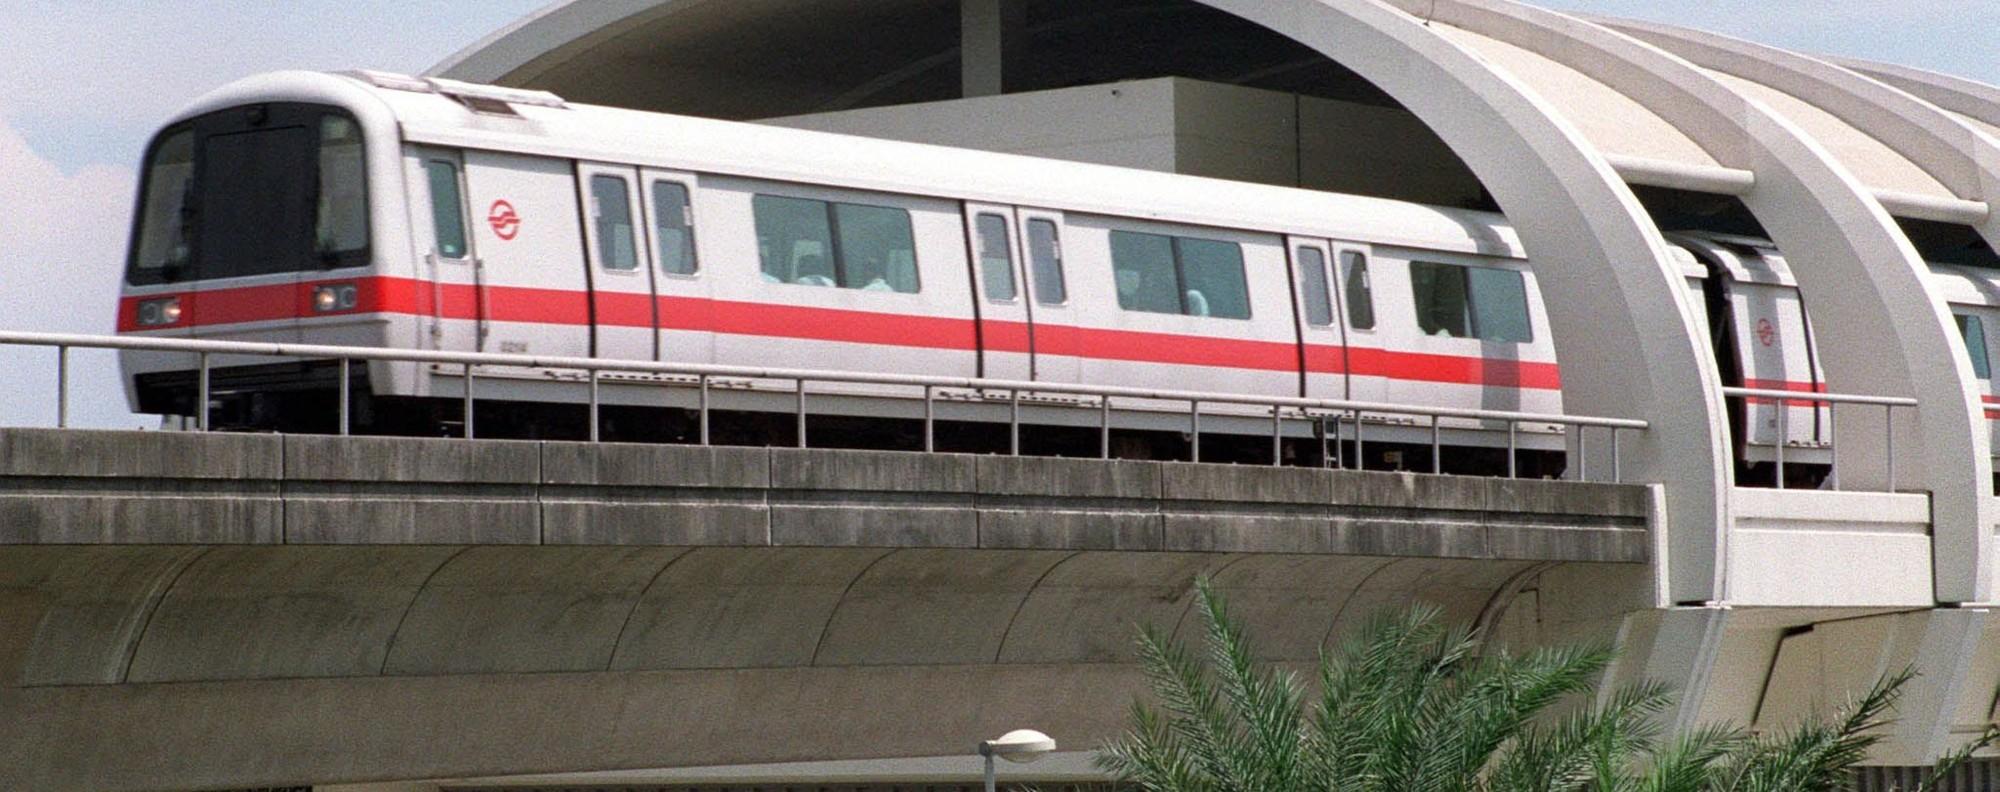 A Singapore Mass Rapid Transit train. Photo: AFP